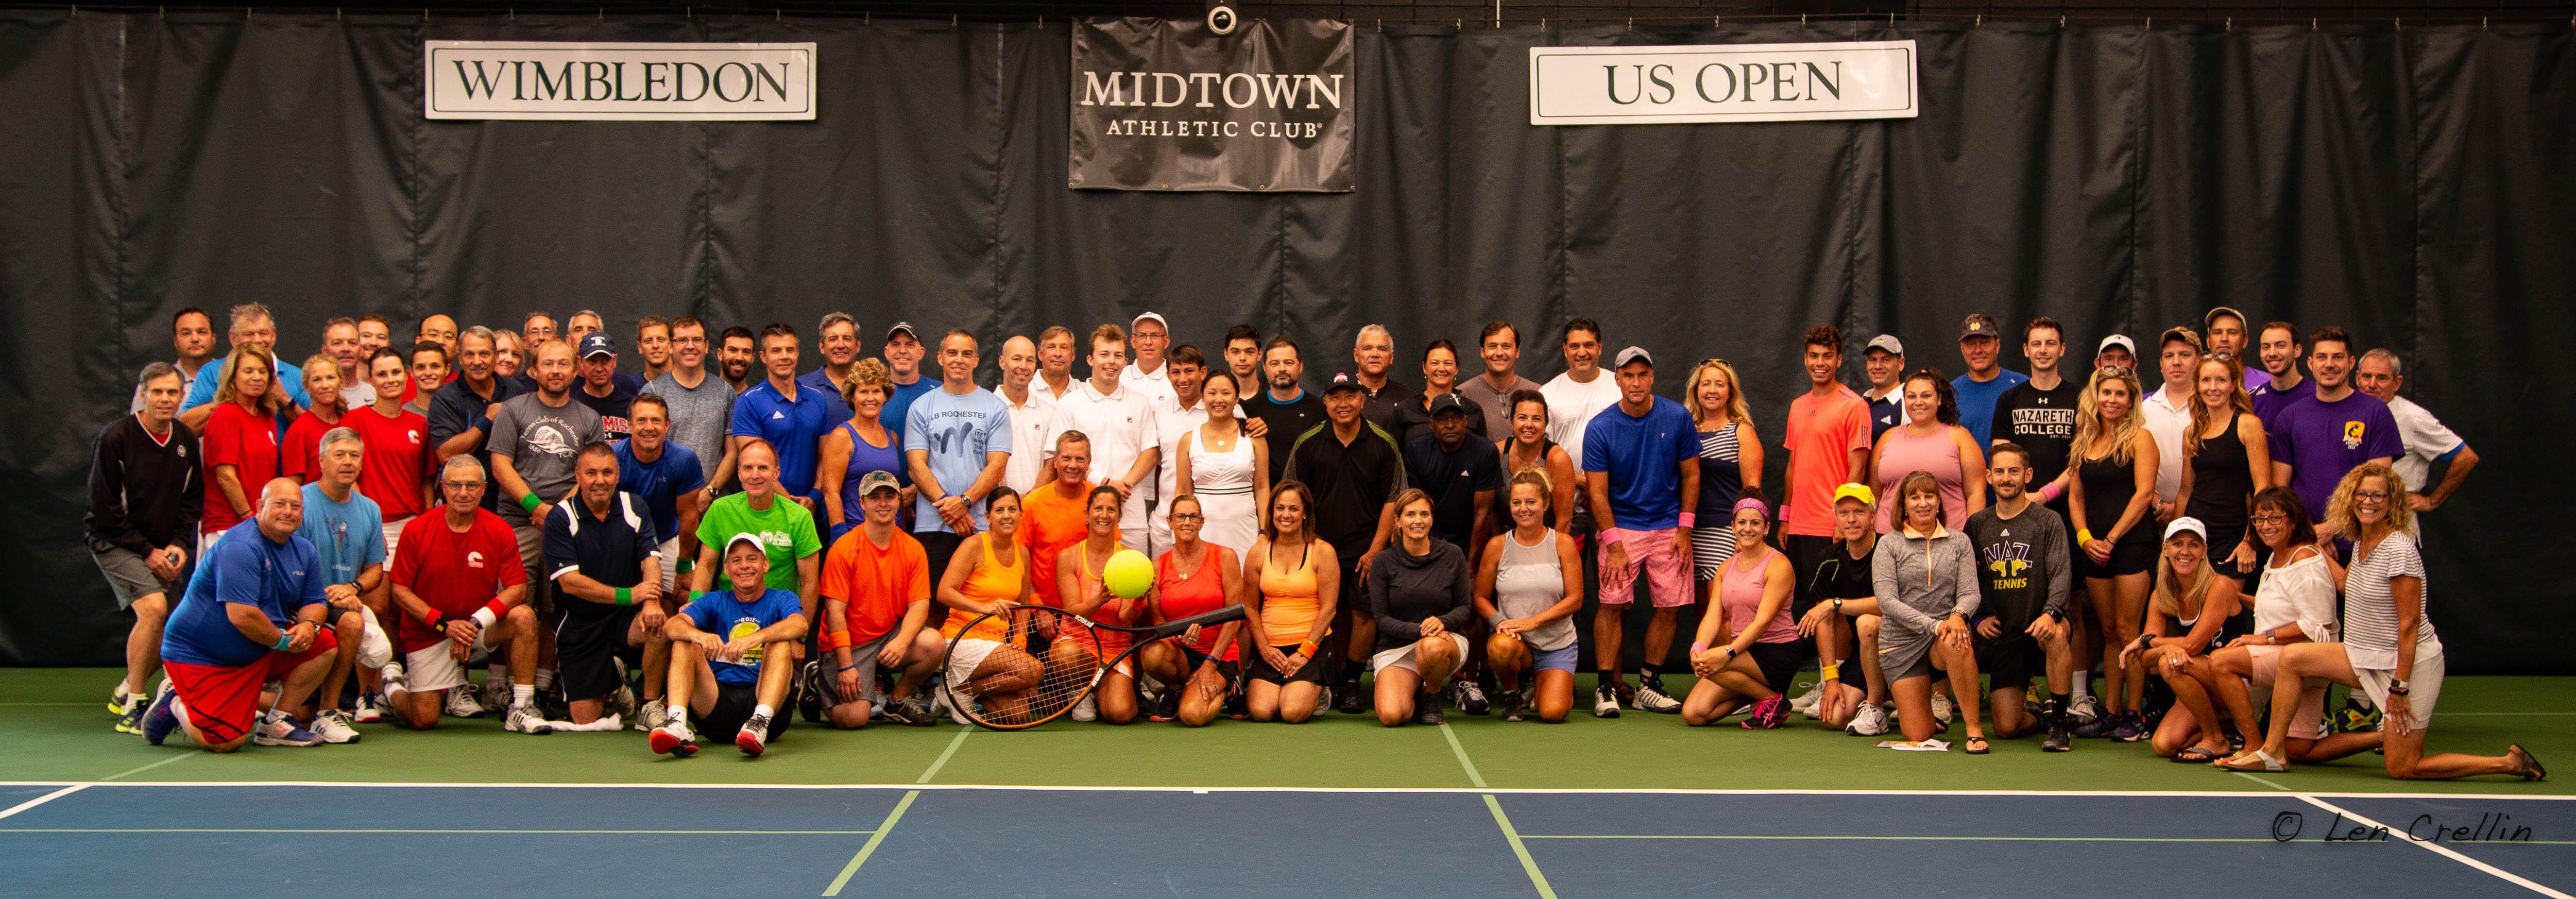 2019 Al Sigl Sports Classic Tennis Benefit